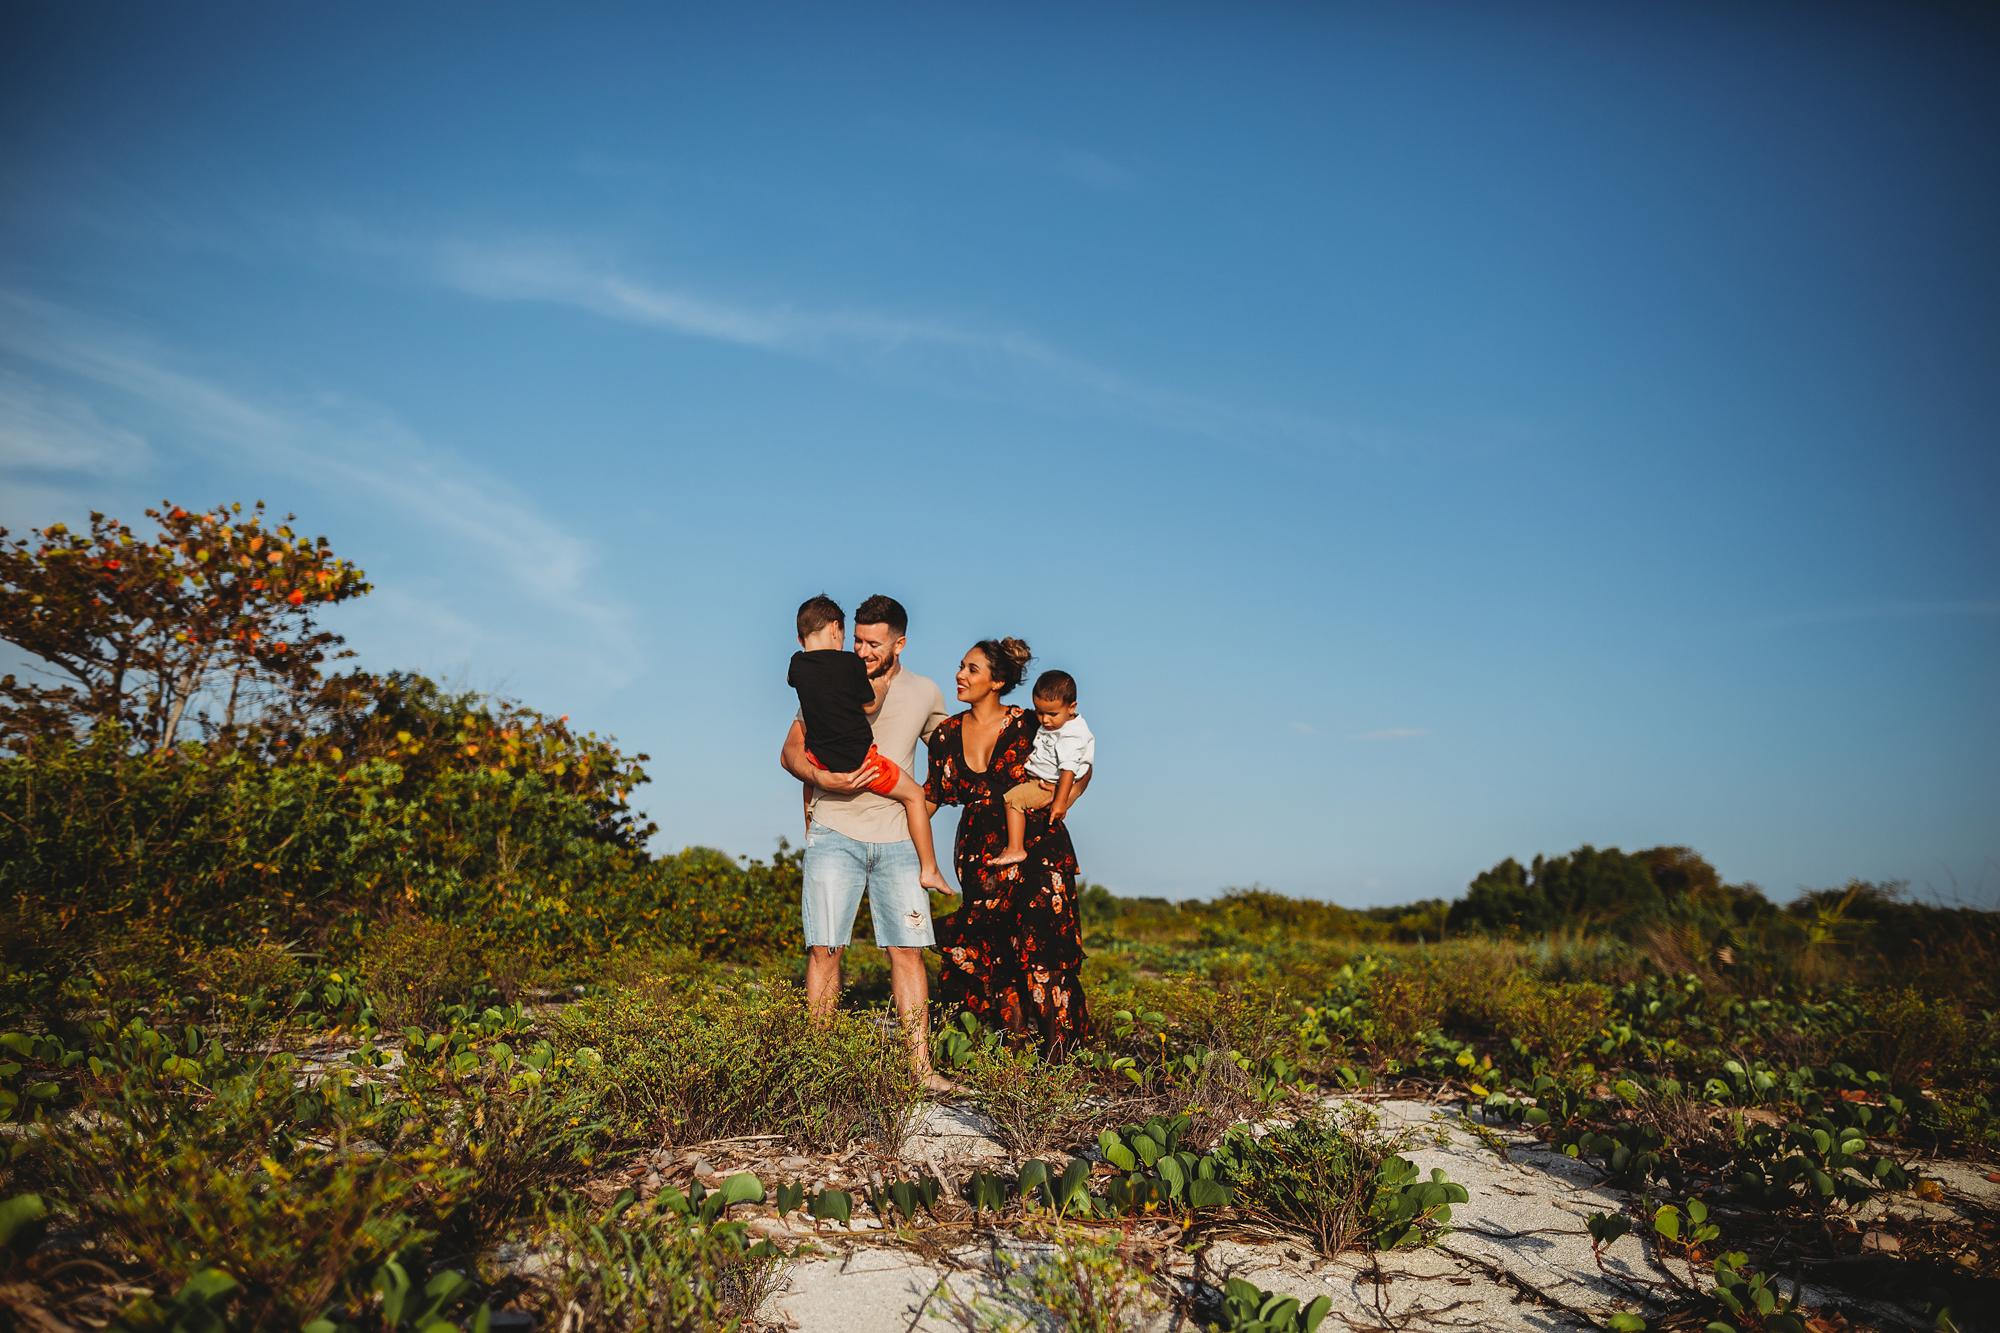 beach family photoshoot, fort desoto beach fl